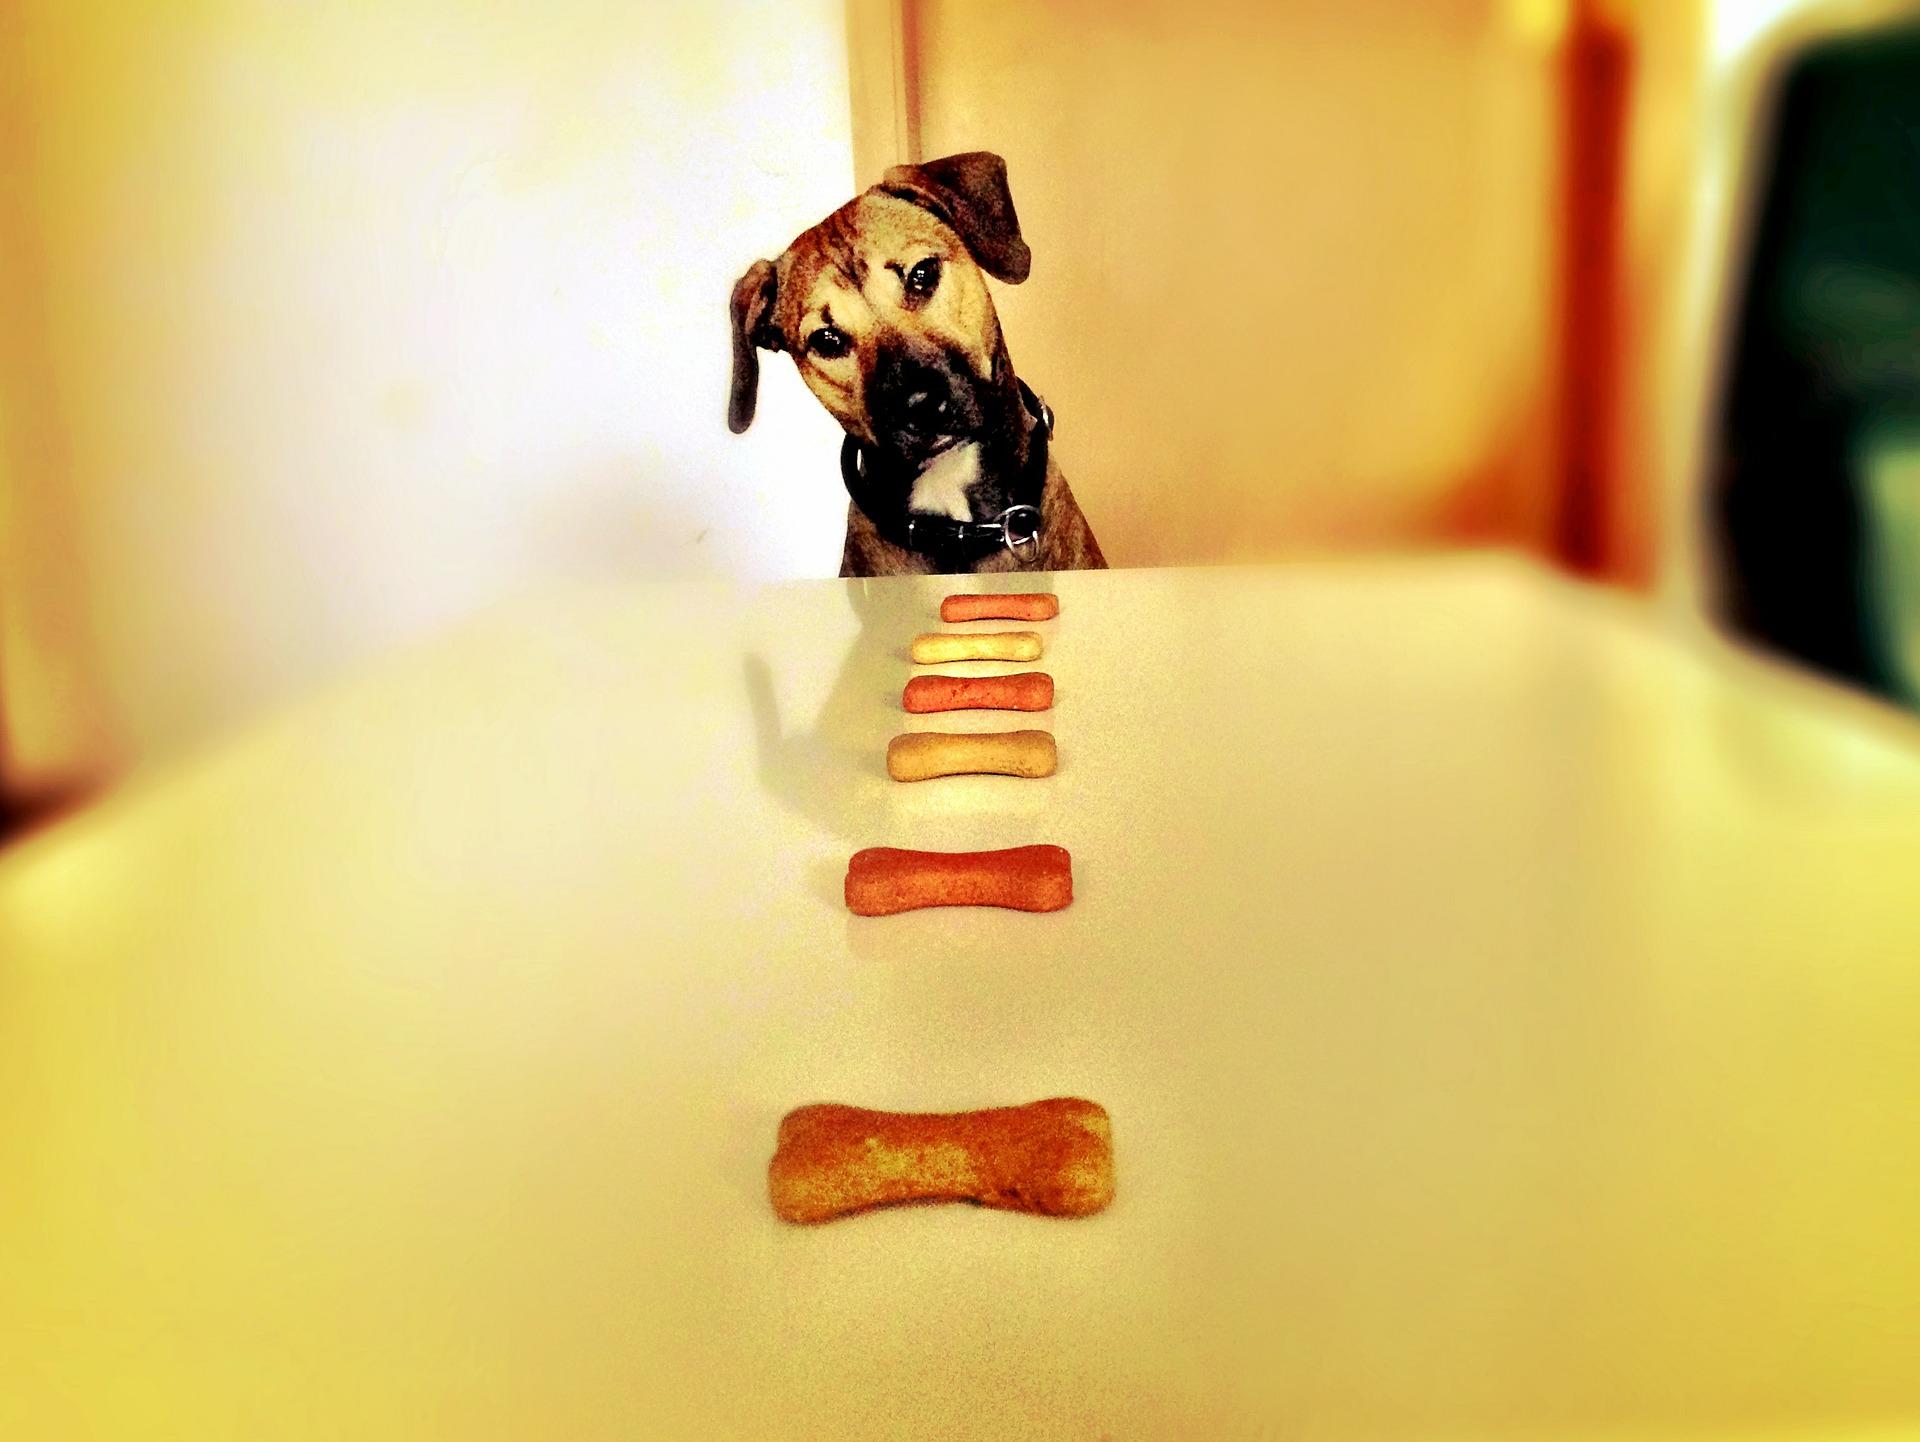 Dog looking at dog training treats on table